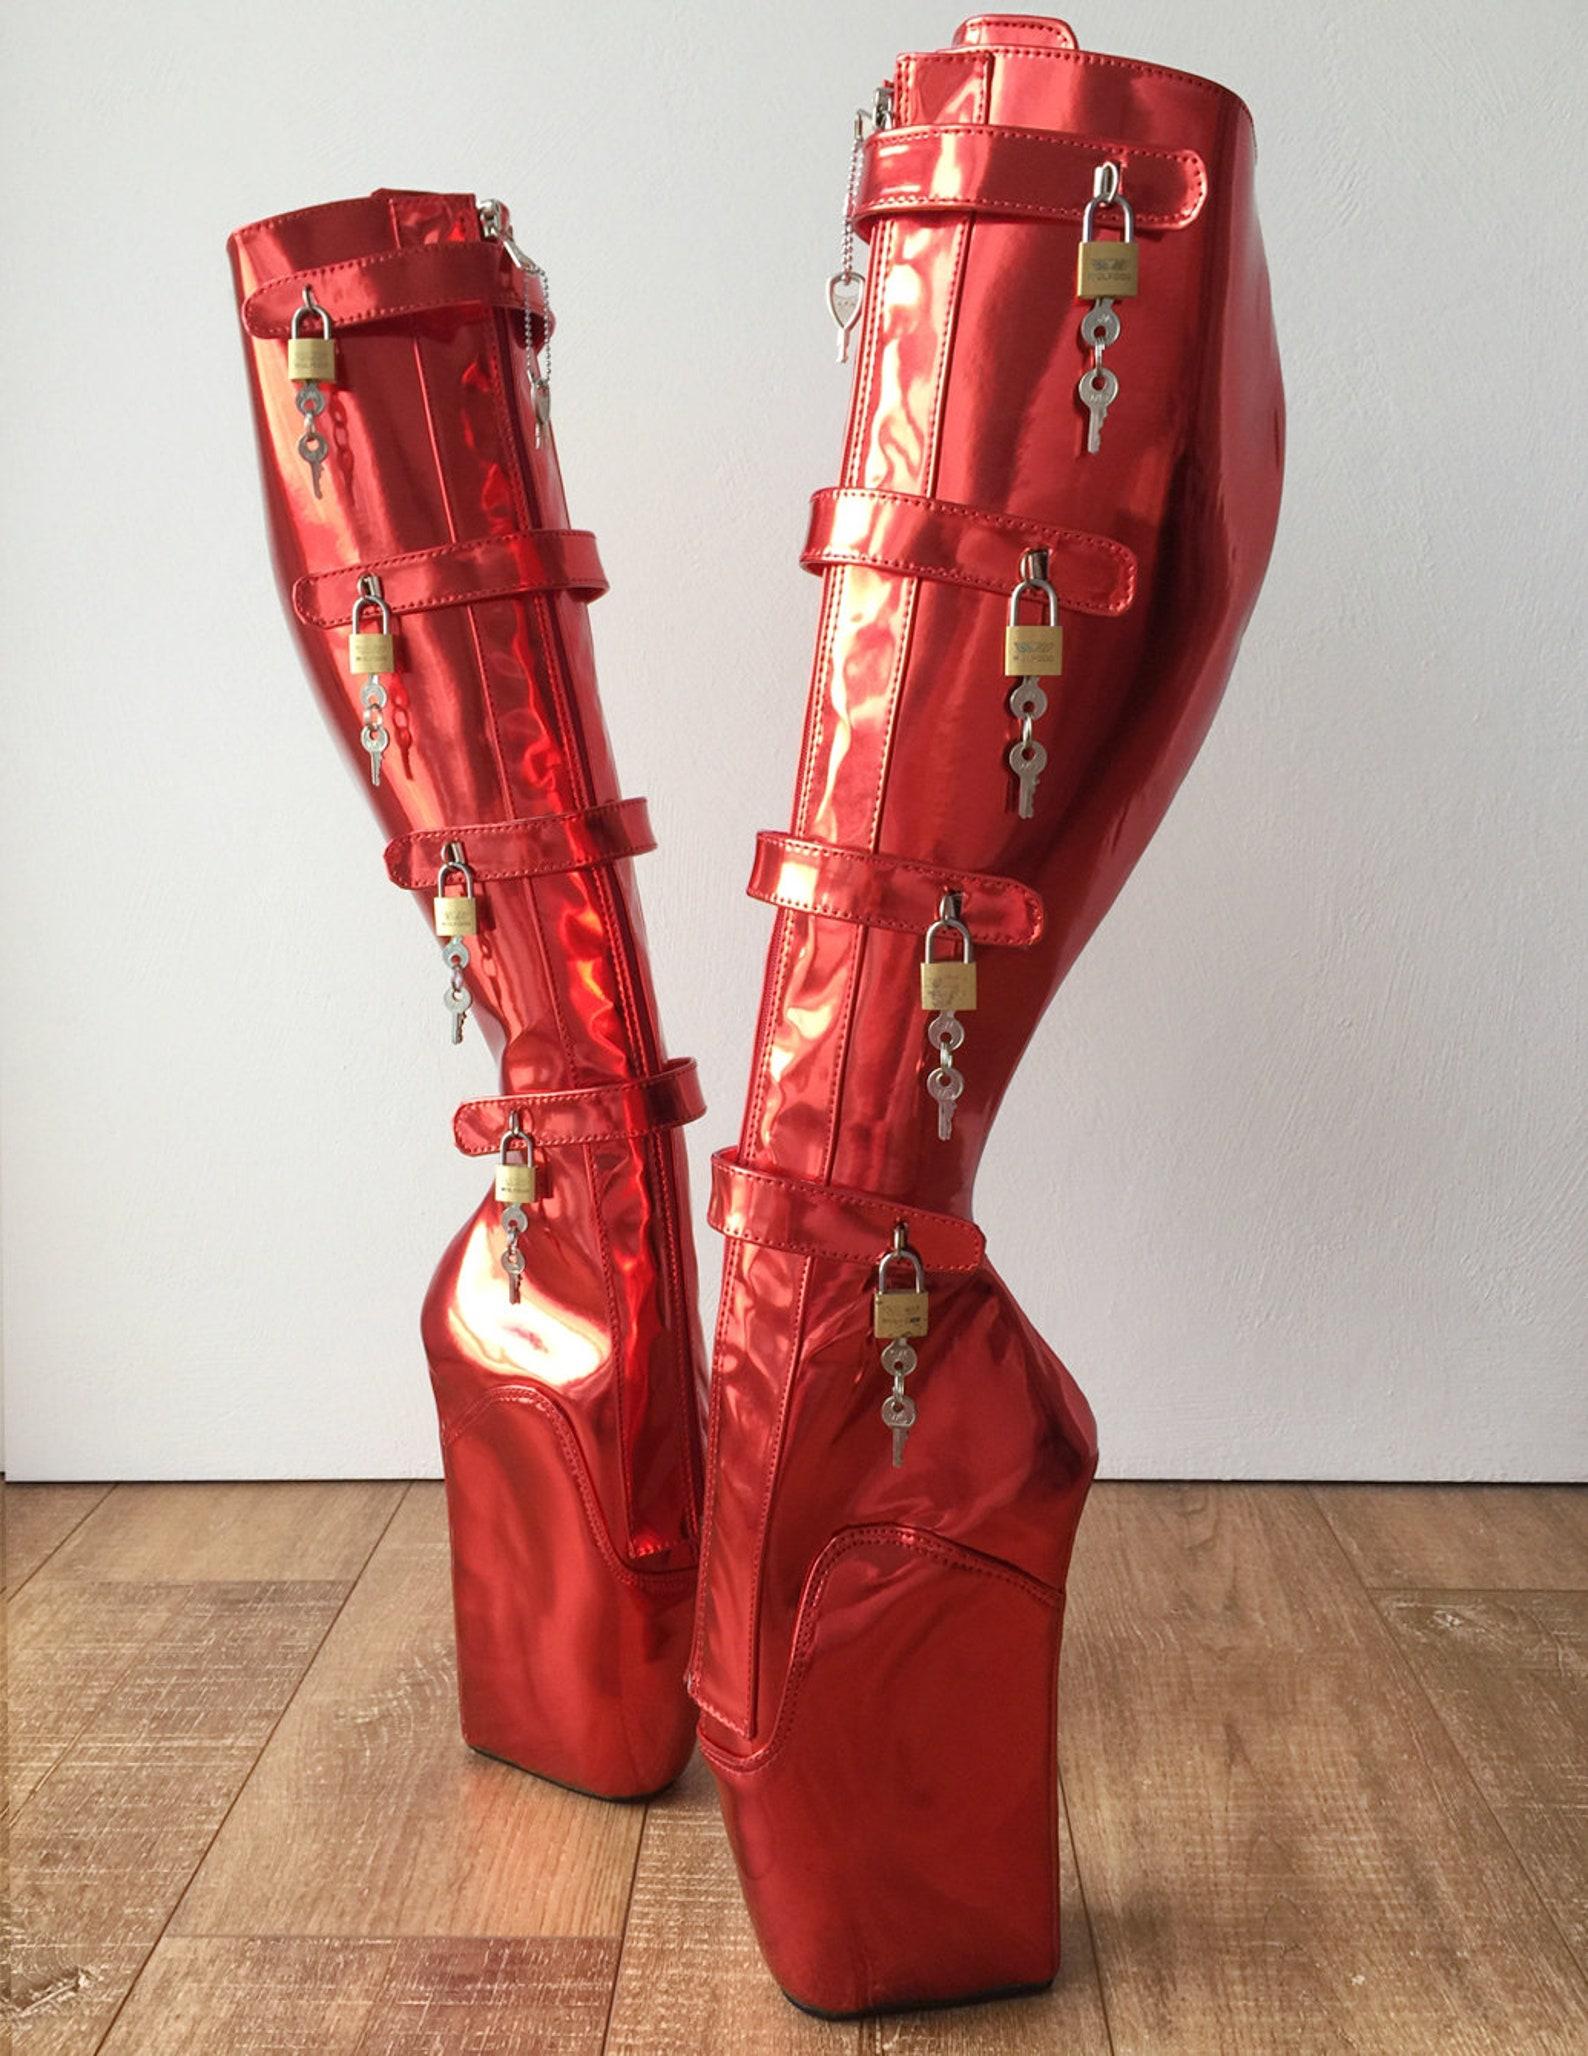 18cm 10 keys lockable beginner ballet wedge boot hoof heelless red metallic